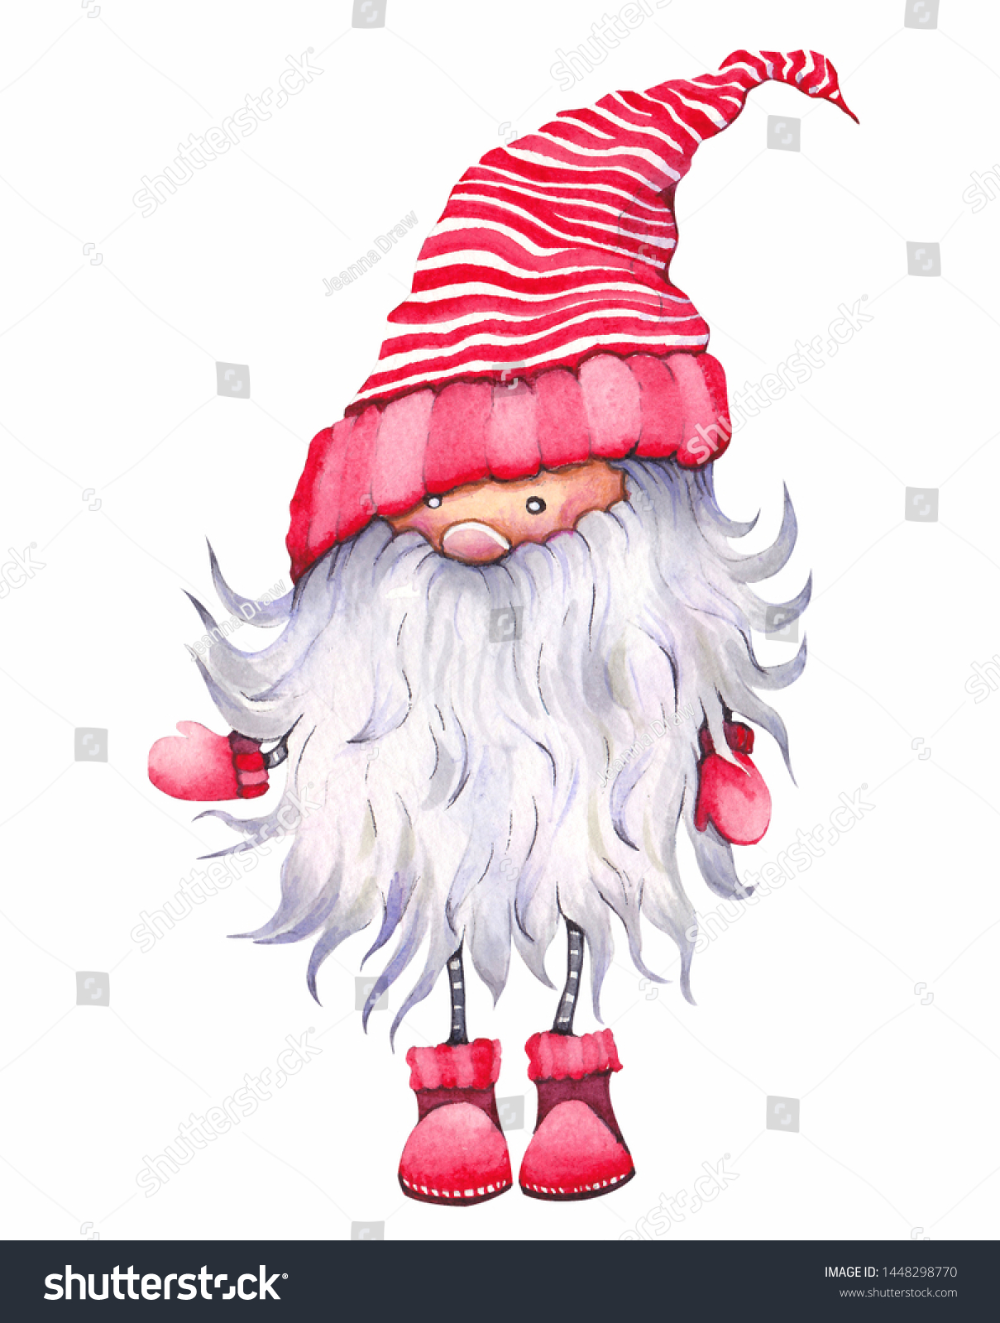 Christmas Cartoon Elf Known Scandinavian Dwarf Holidays Objects Stock Image In 2020 Christmas Art Christmas Cartoons Christmas Tree Clipart